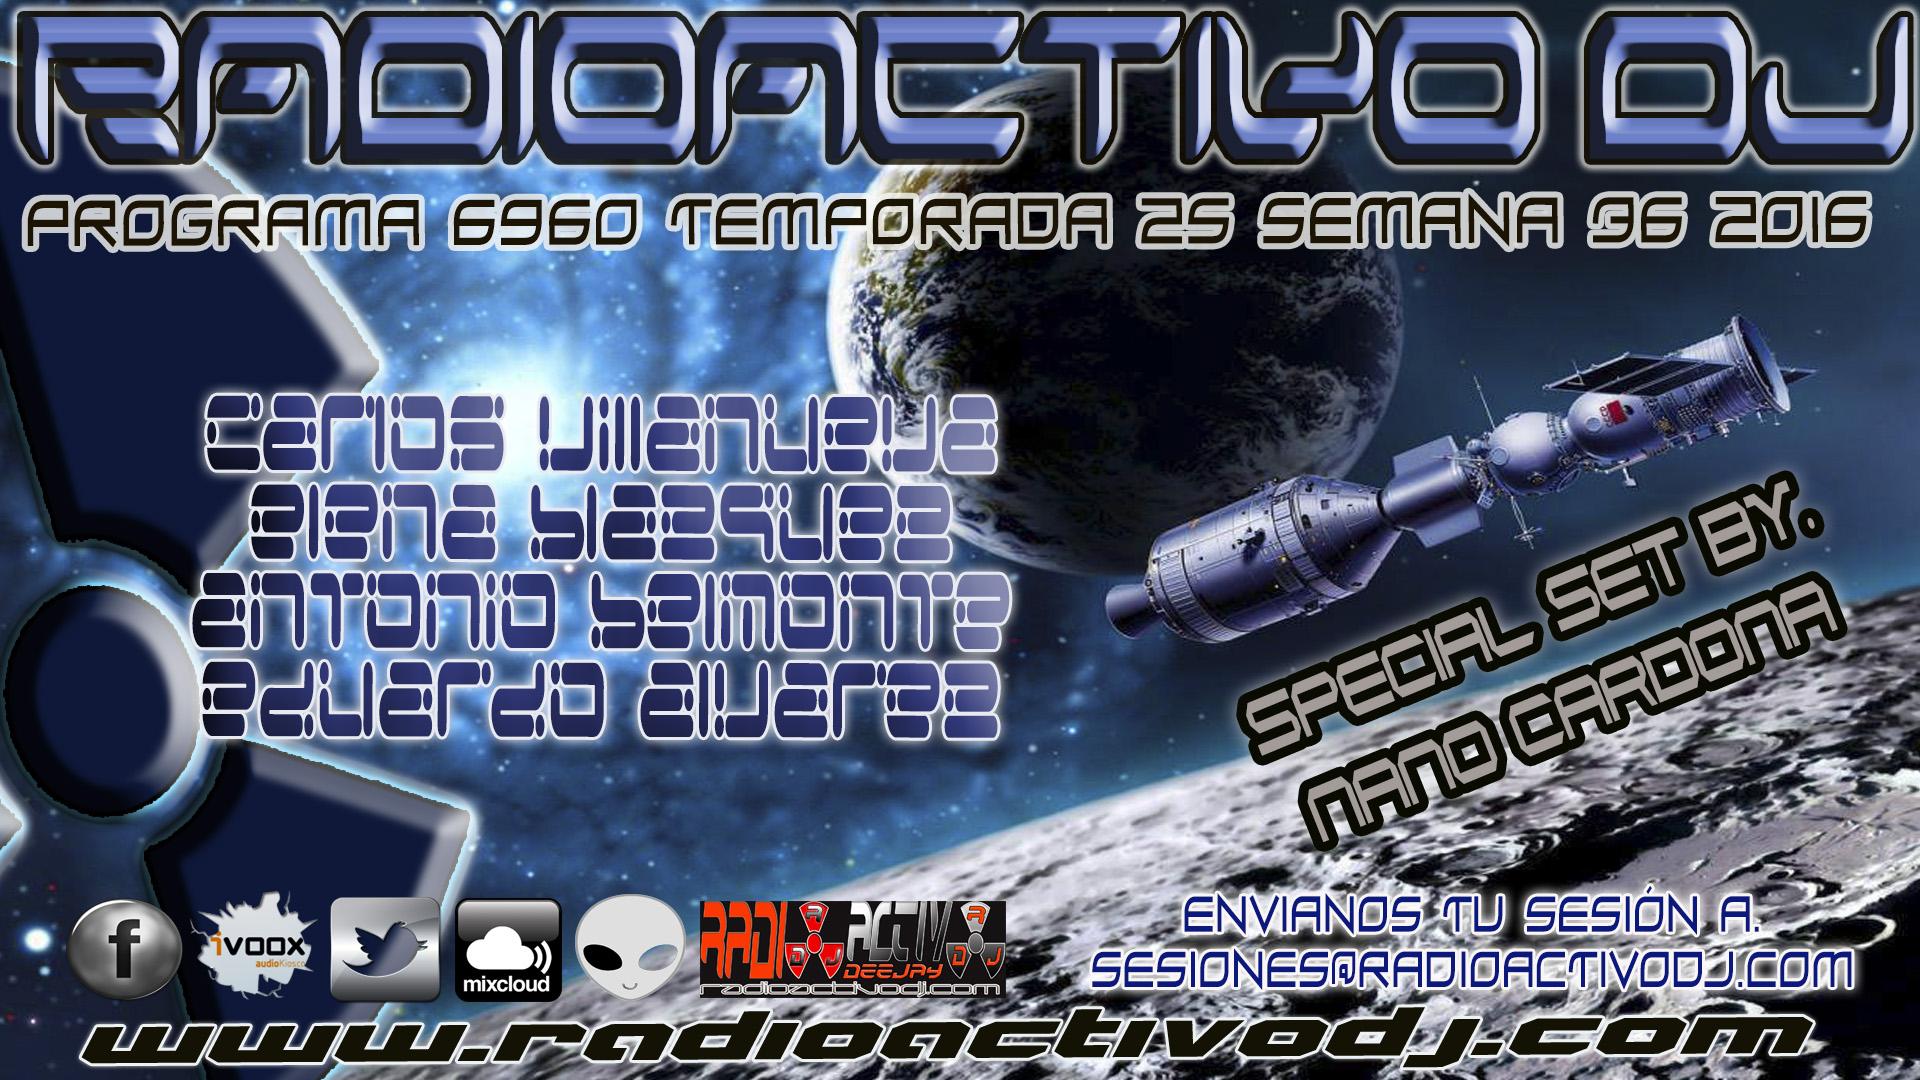 RADIOACTIVO-DJ-36-2016